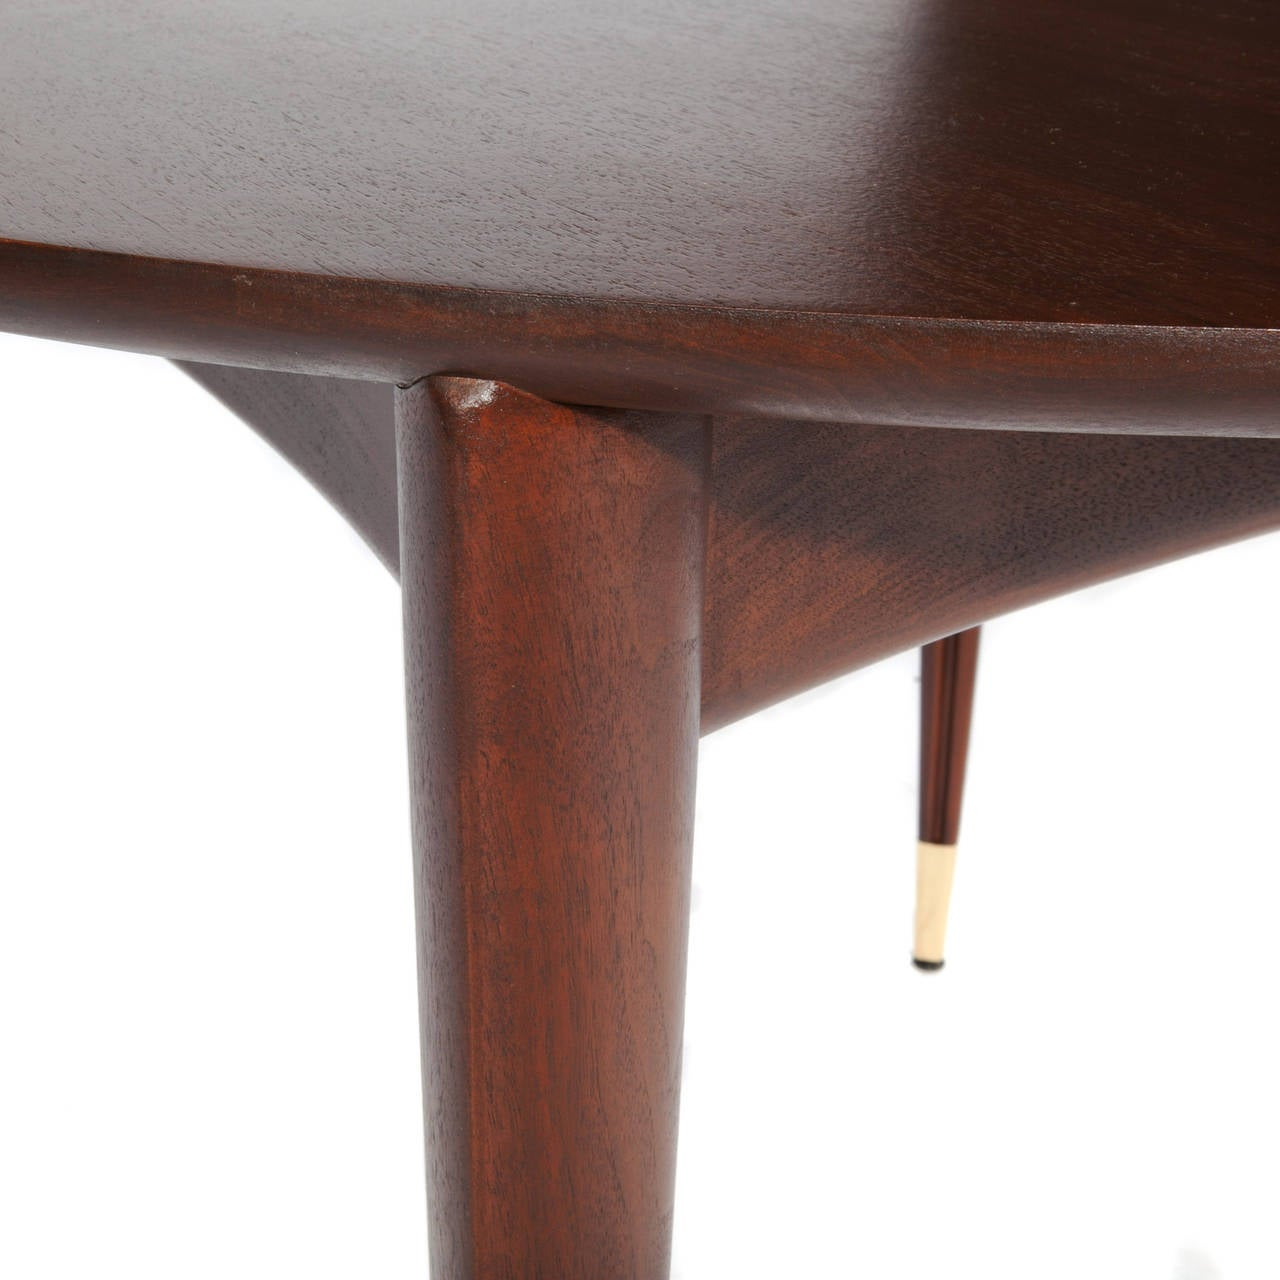 Walnut Extension Dining Table by Gio Ponti at 1stdibs : 08l from www.1stdibs.com size 1280 x 1280 jpeg 111kB